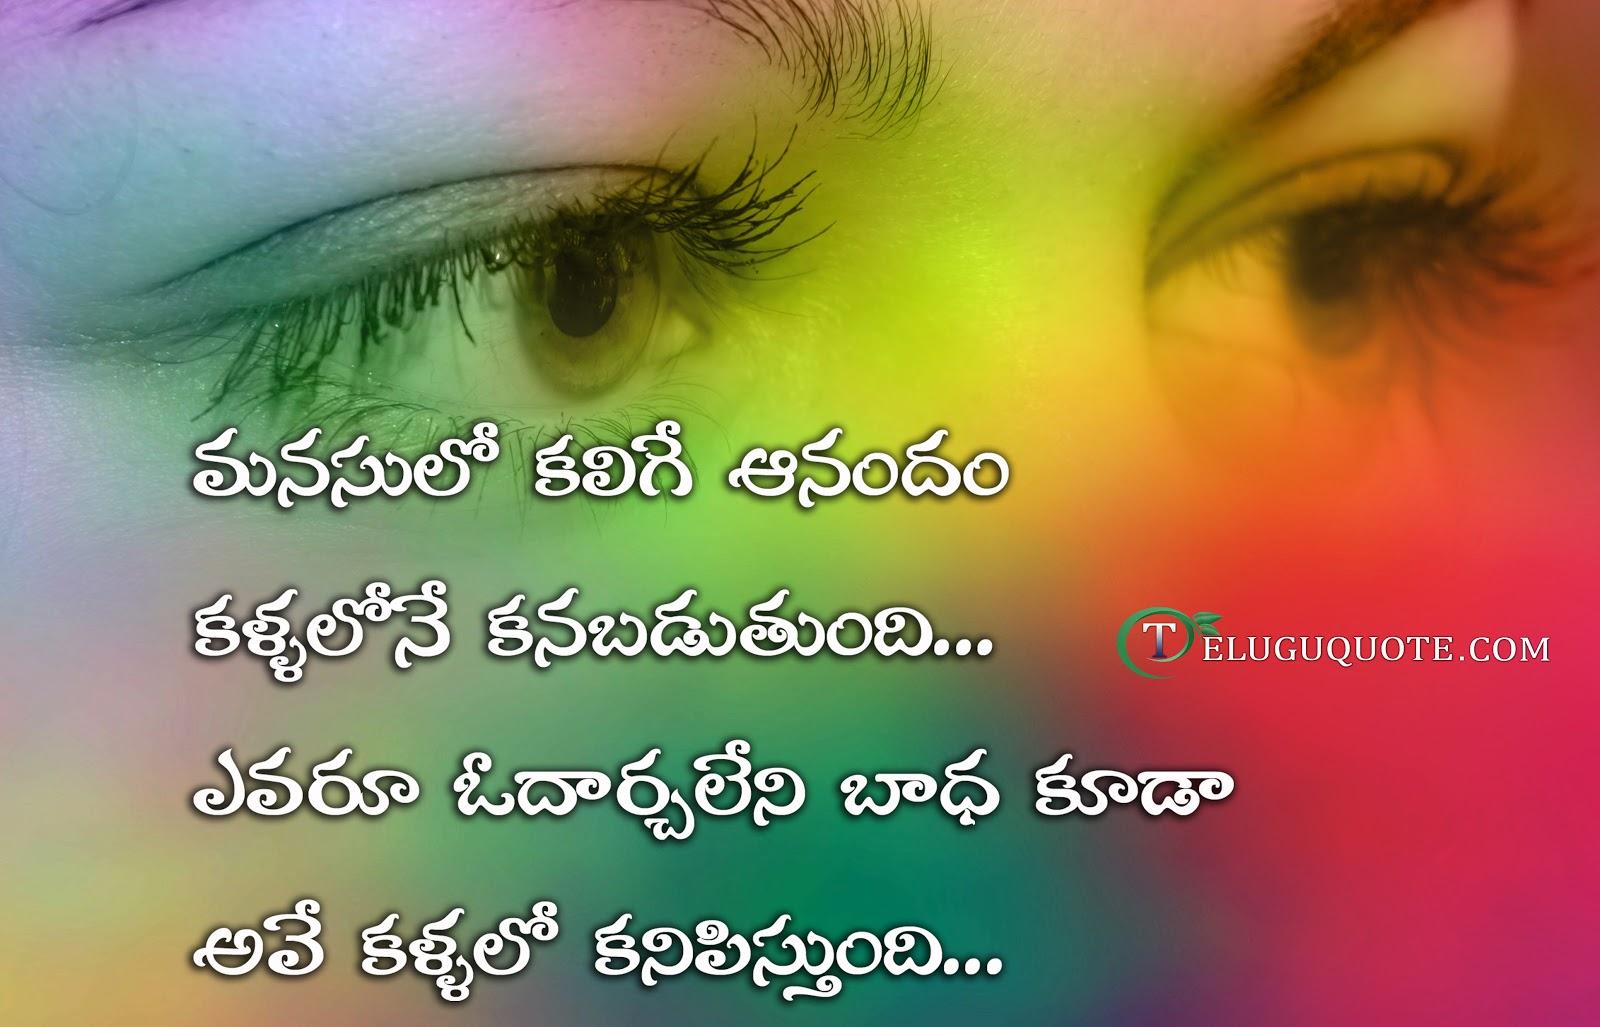 Telugu Best Quotations Images